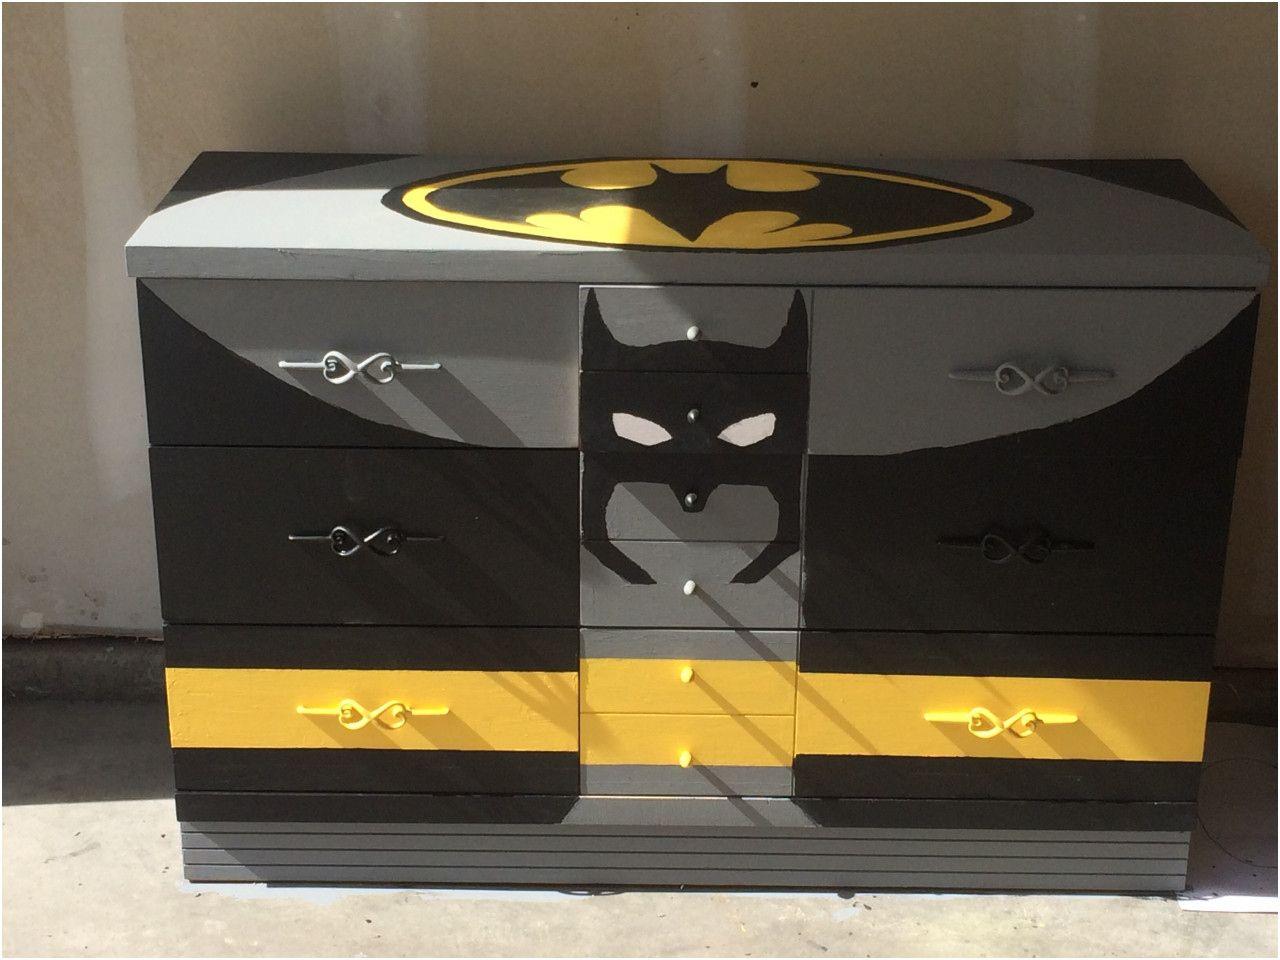 Httpsipinimgcomoriginalsddddc - Batman bedroom decorating ideas